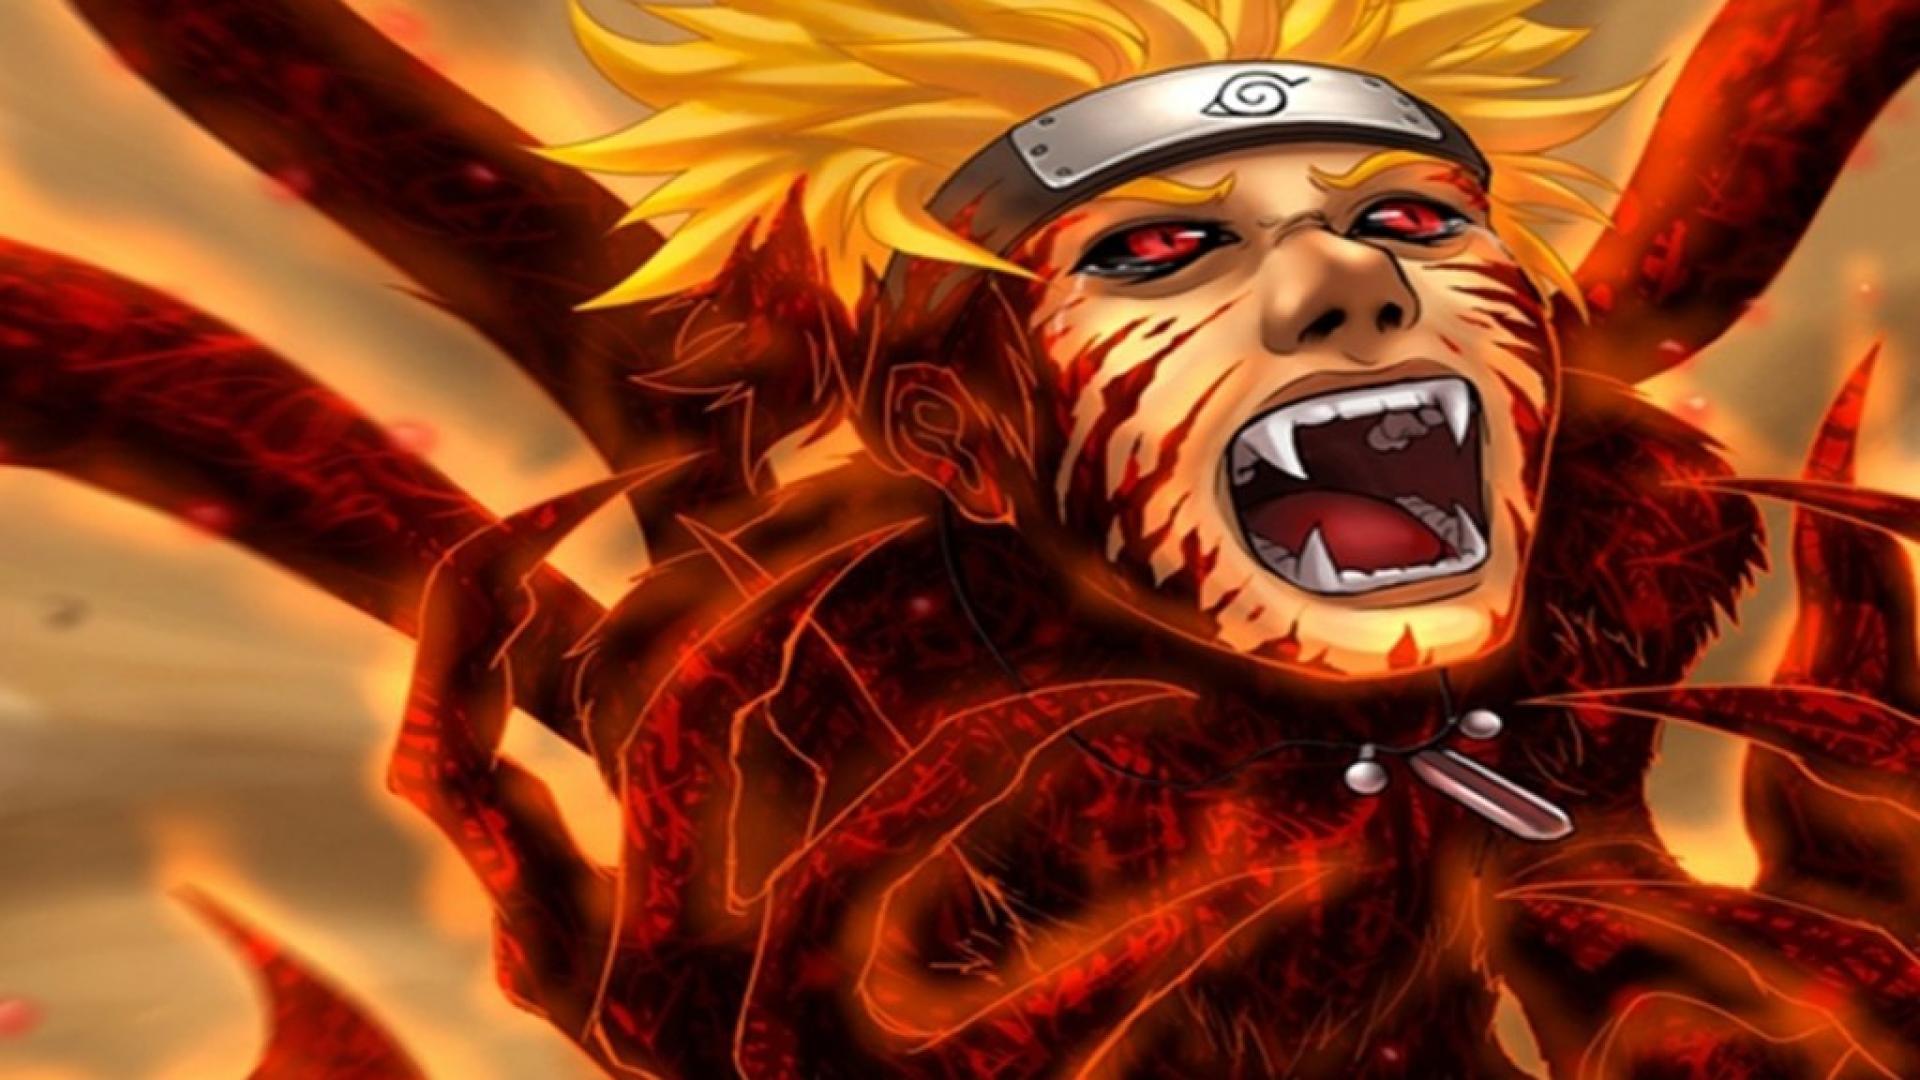 48 ] Naruto Wallpaper Download On WallpaperSafari